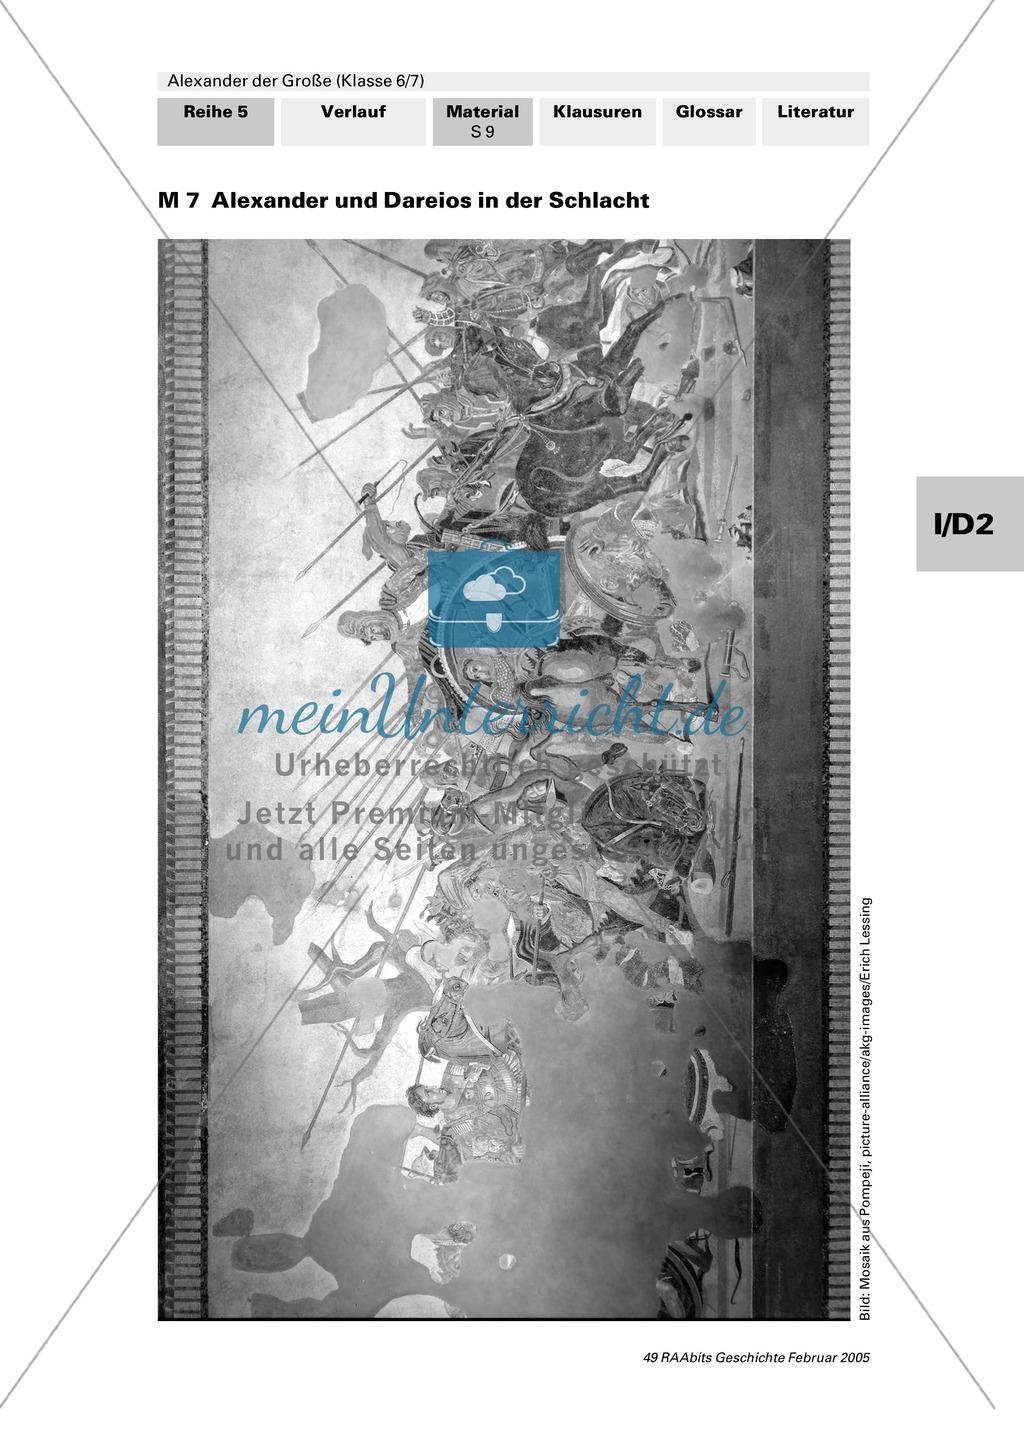 Alexander der Große: Eroberungsfeldzüge an Autorentexten, Karten, Bildern Preview 4